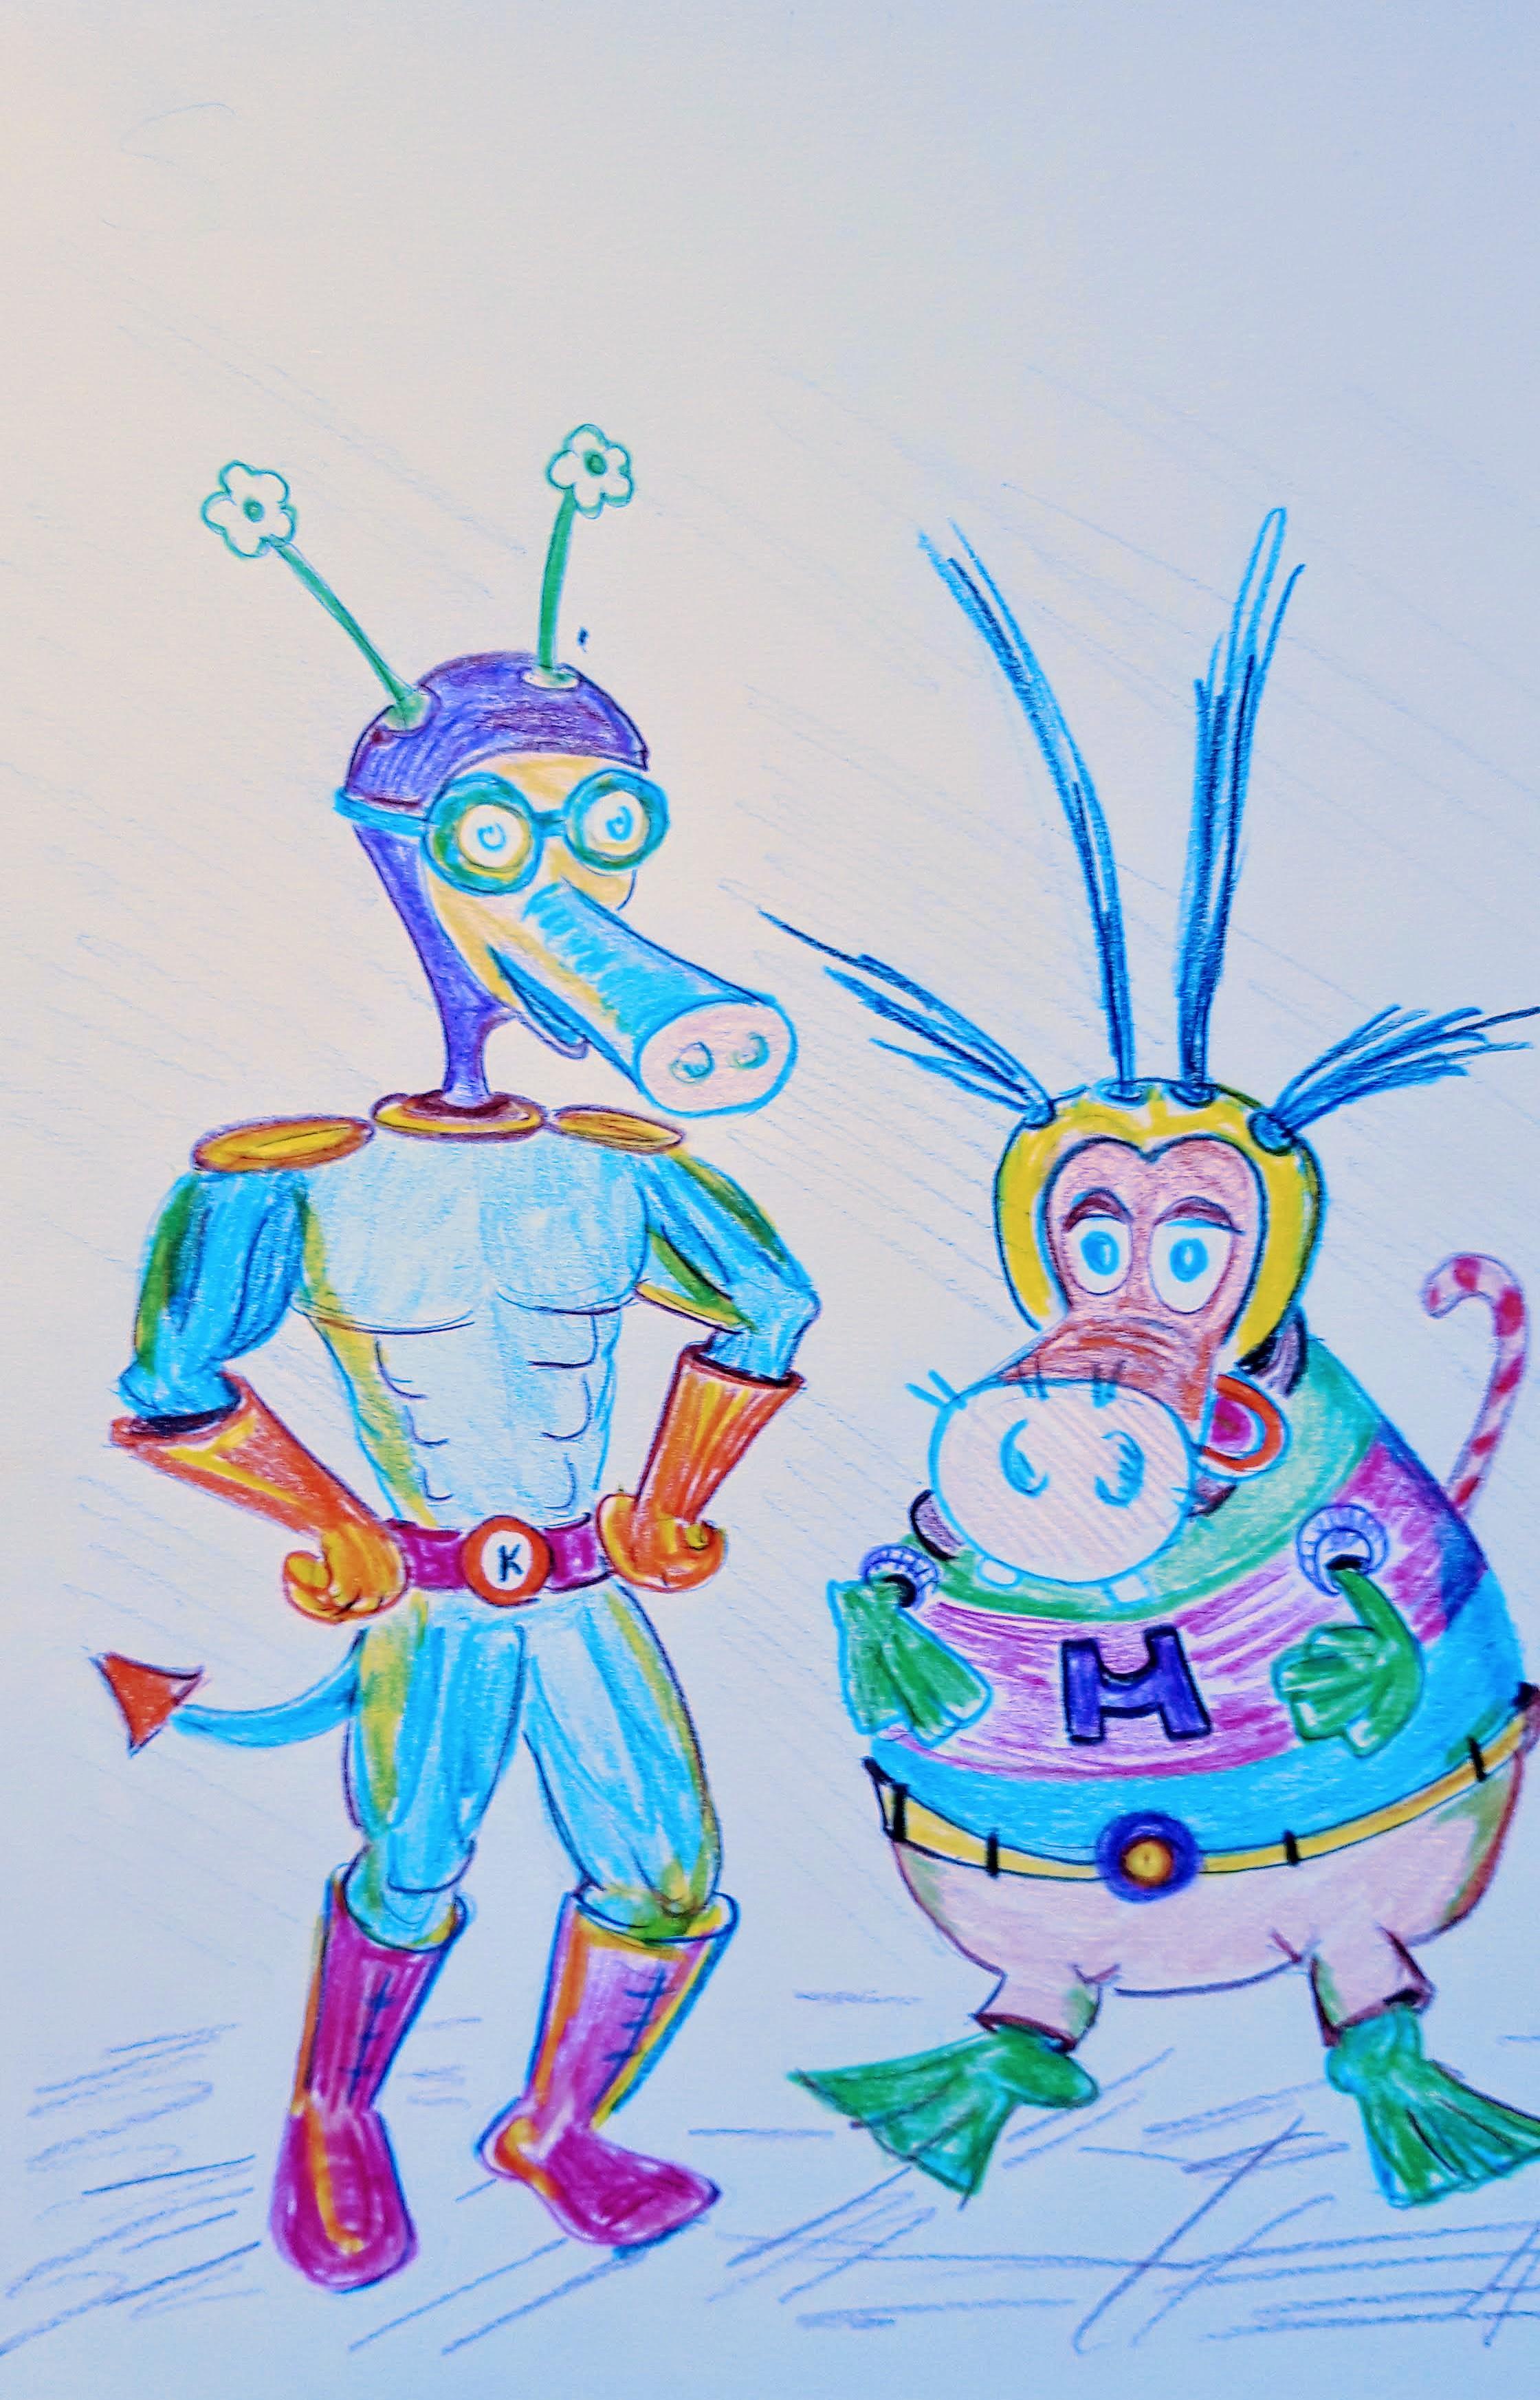 The Karillapig and Hippobuffafrog superheros